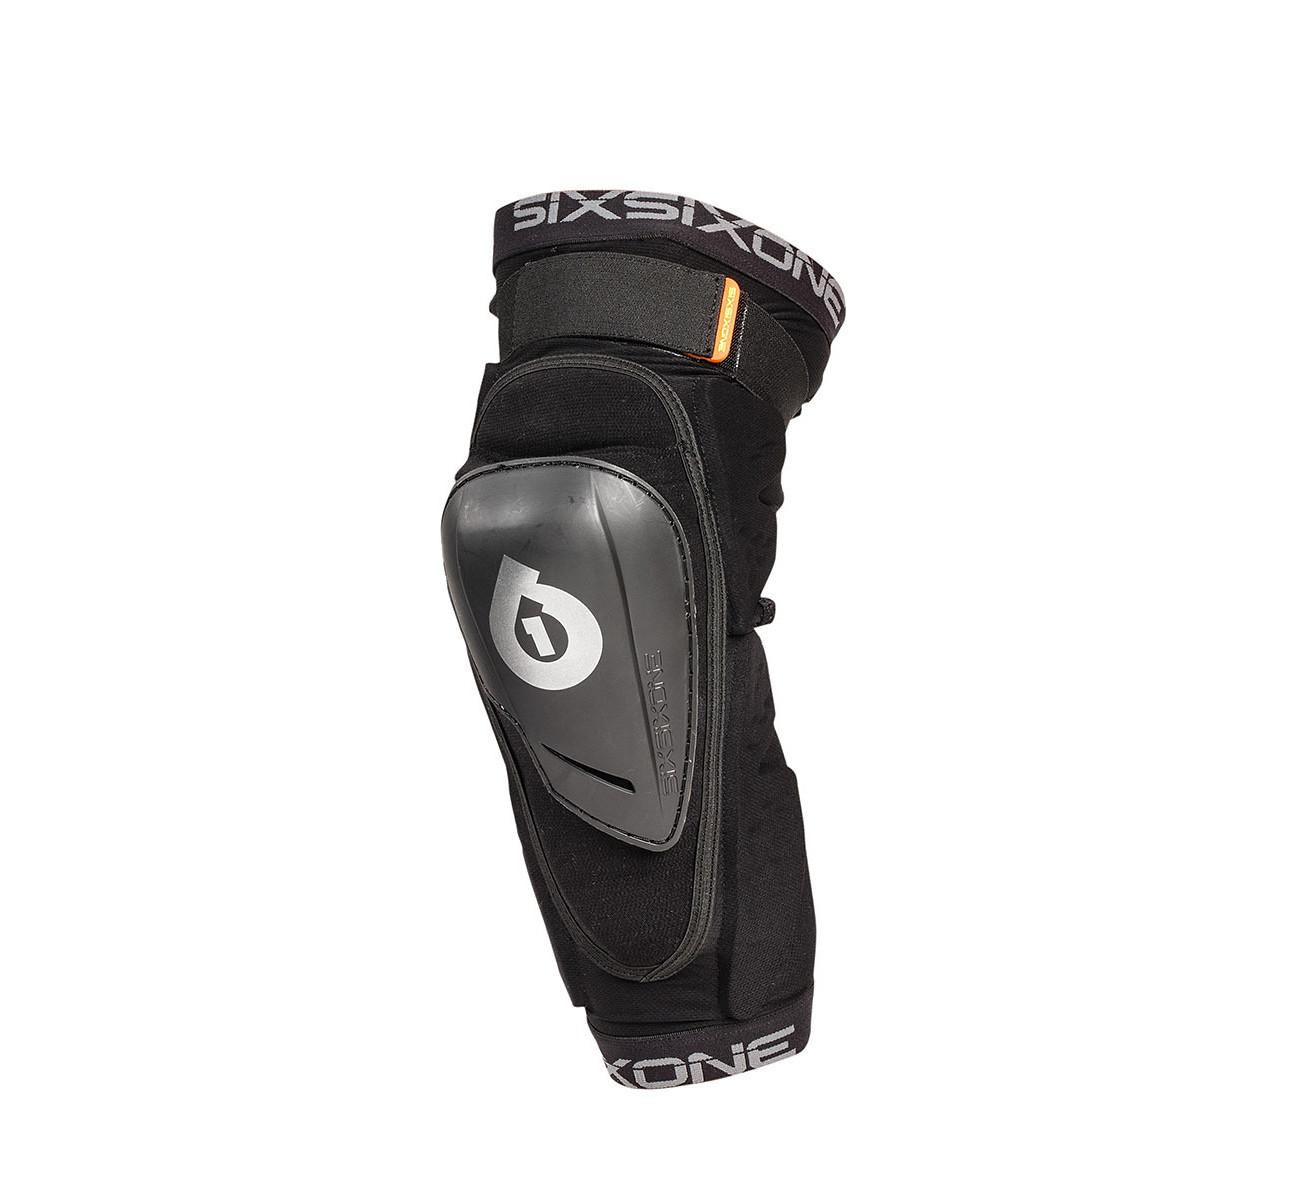 SixSixOne Rage Hard Shell Knee Pad